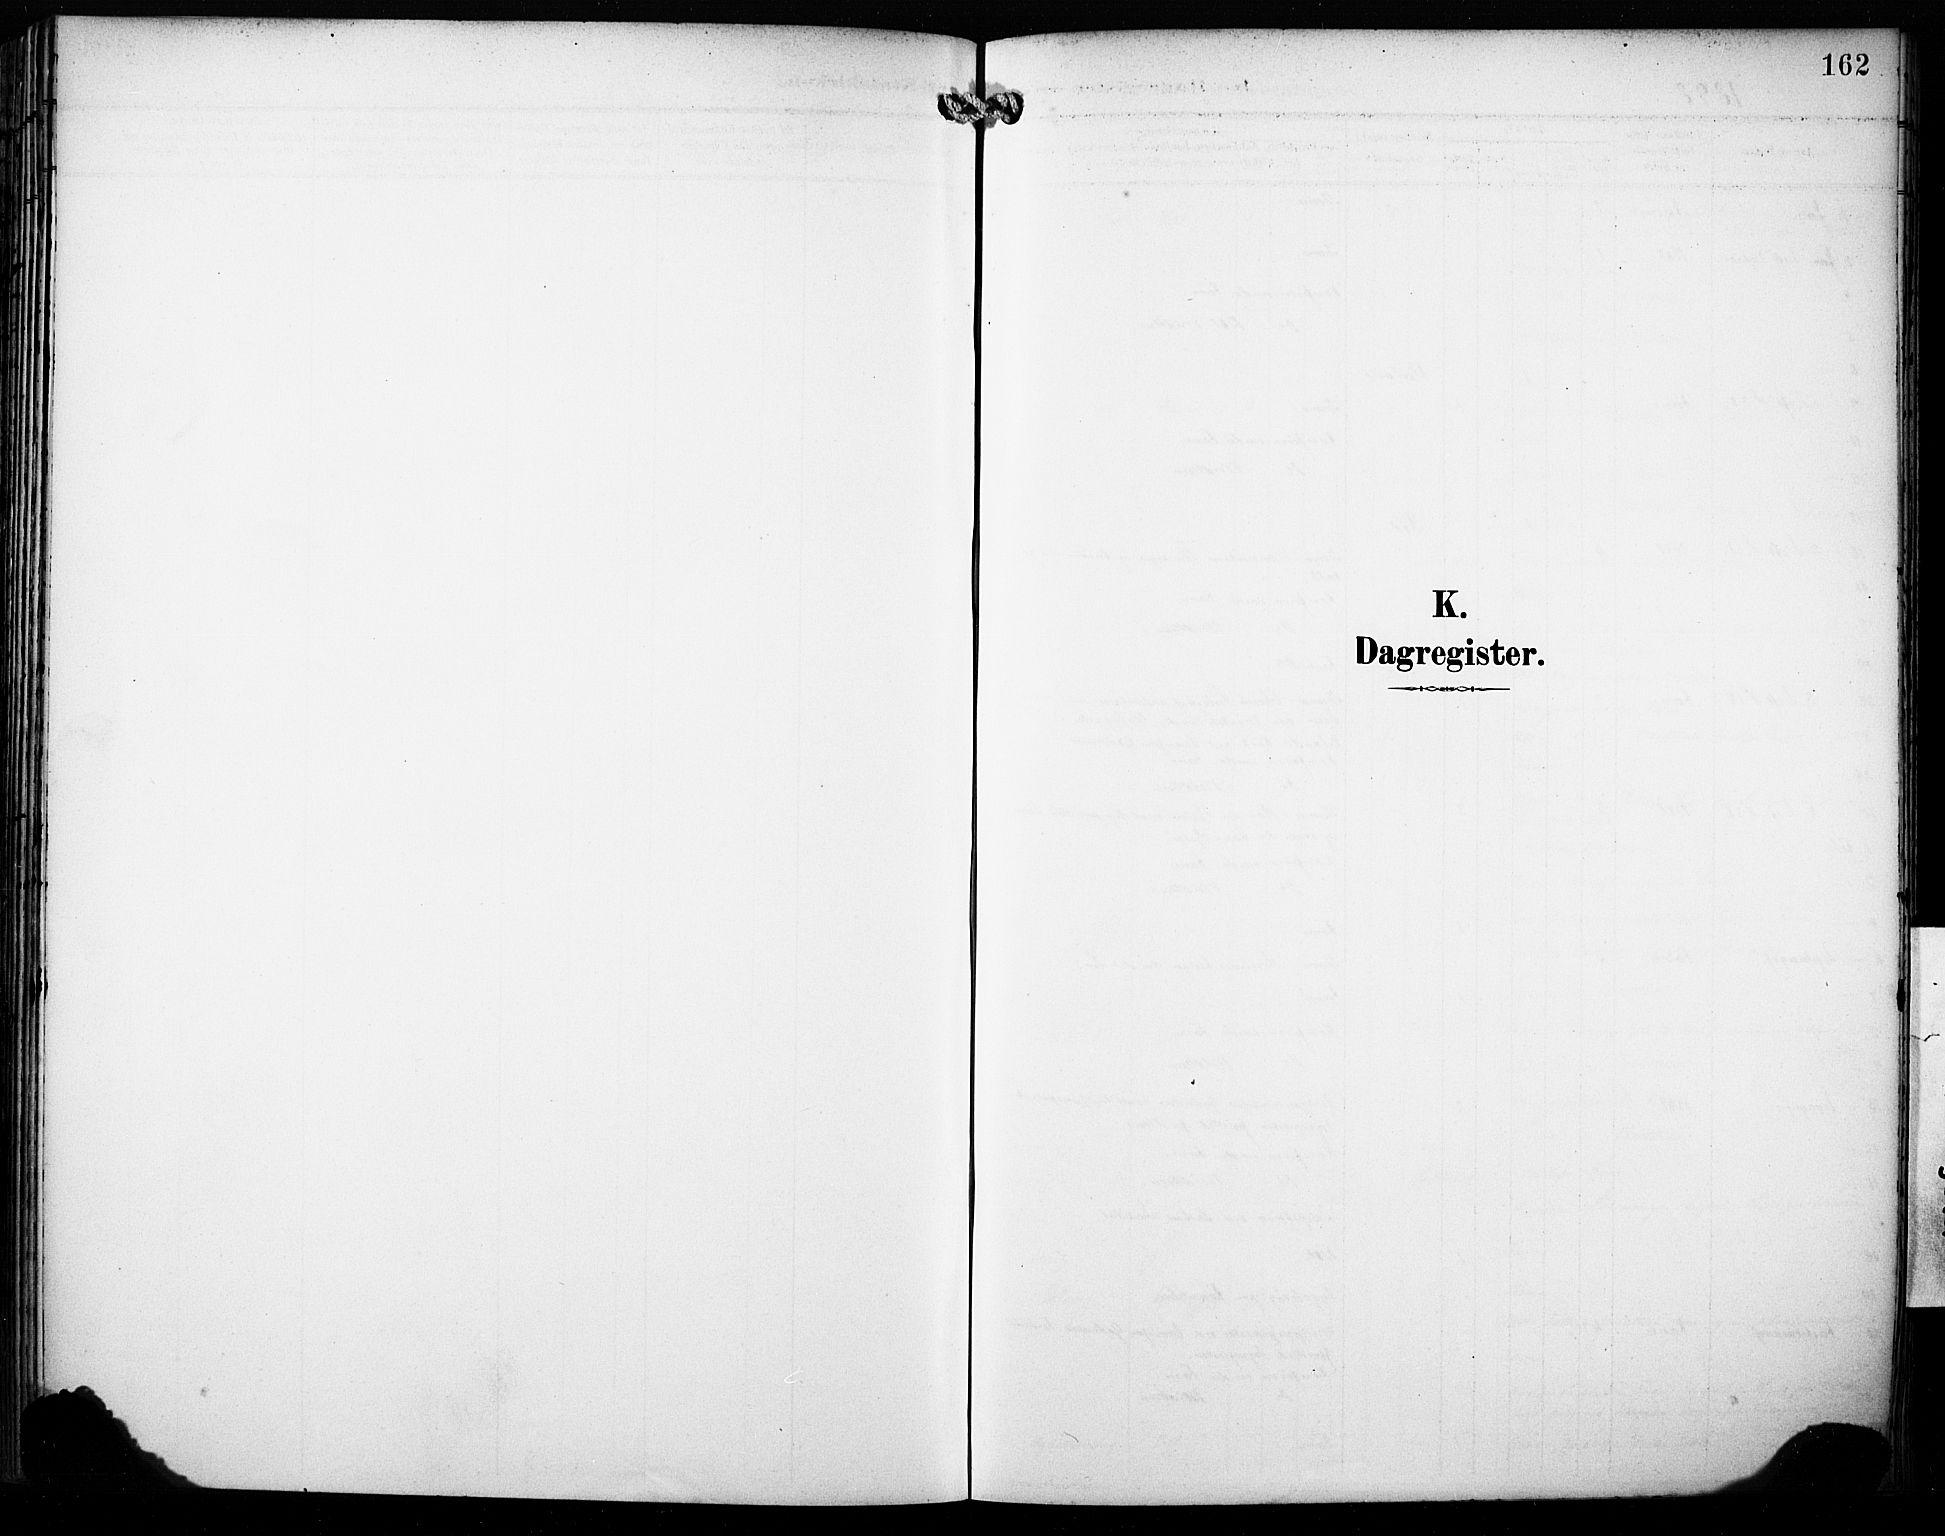 SAB, Fana Sokneprestembete, H/Haa/Haab/L0003: Ministerialbok nr. B 3, 1898-1907, s. 162